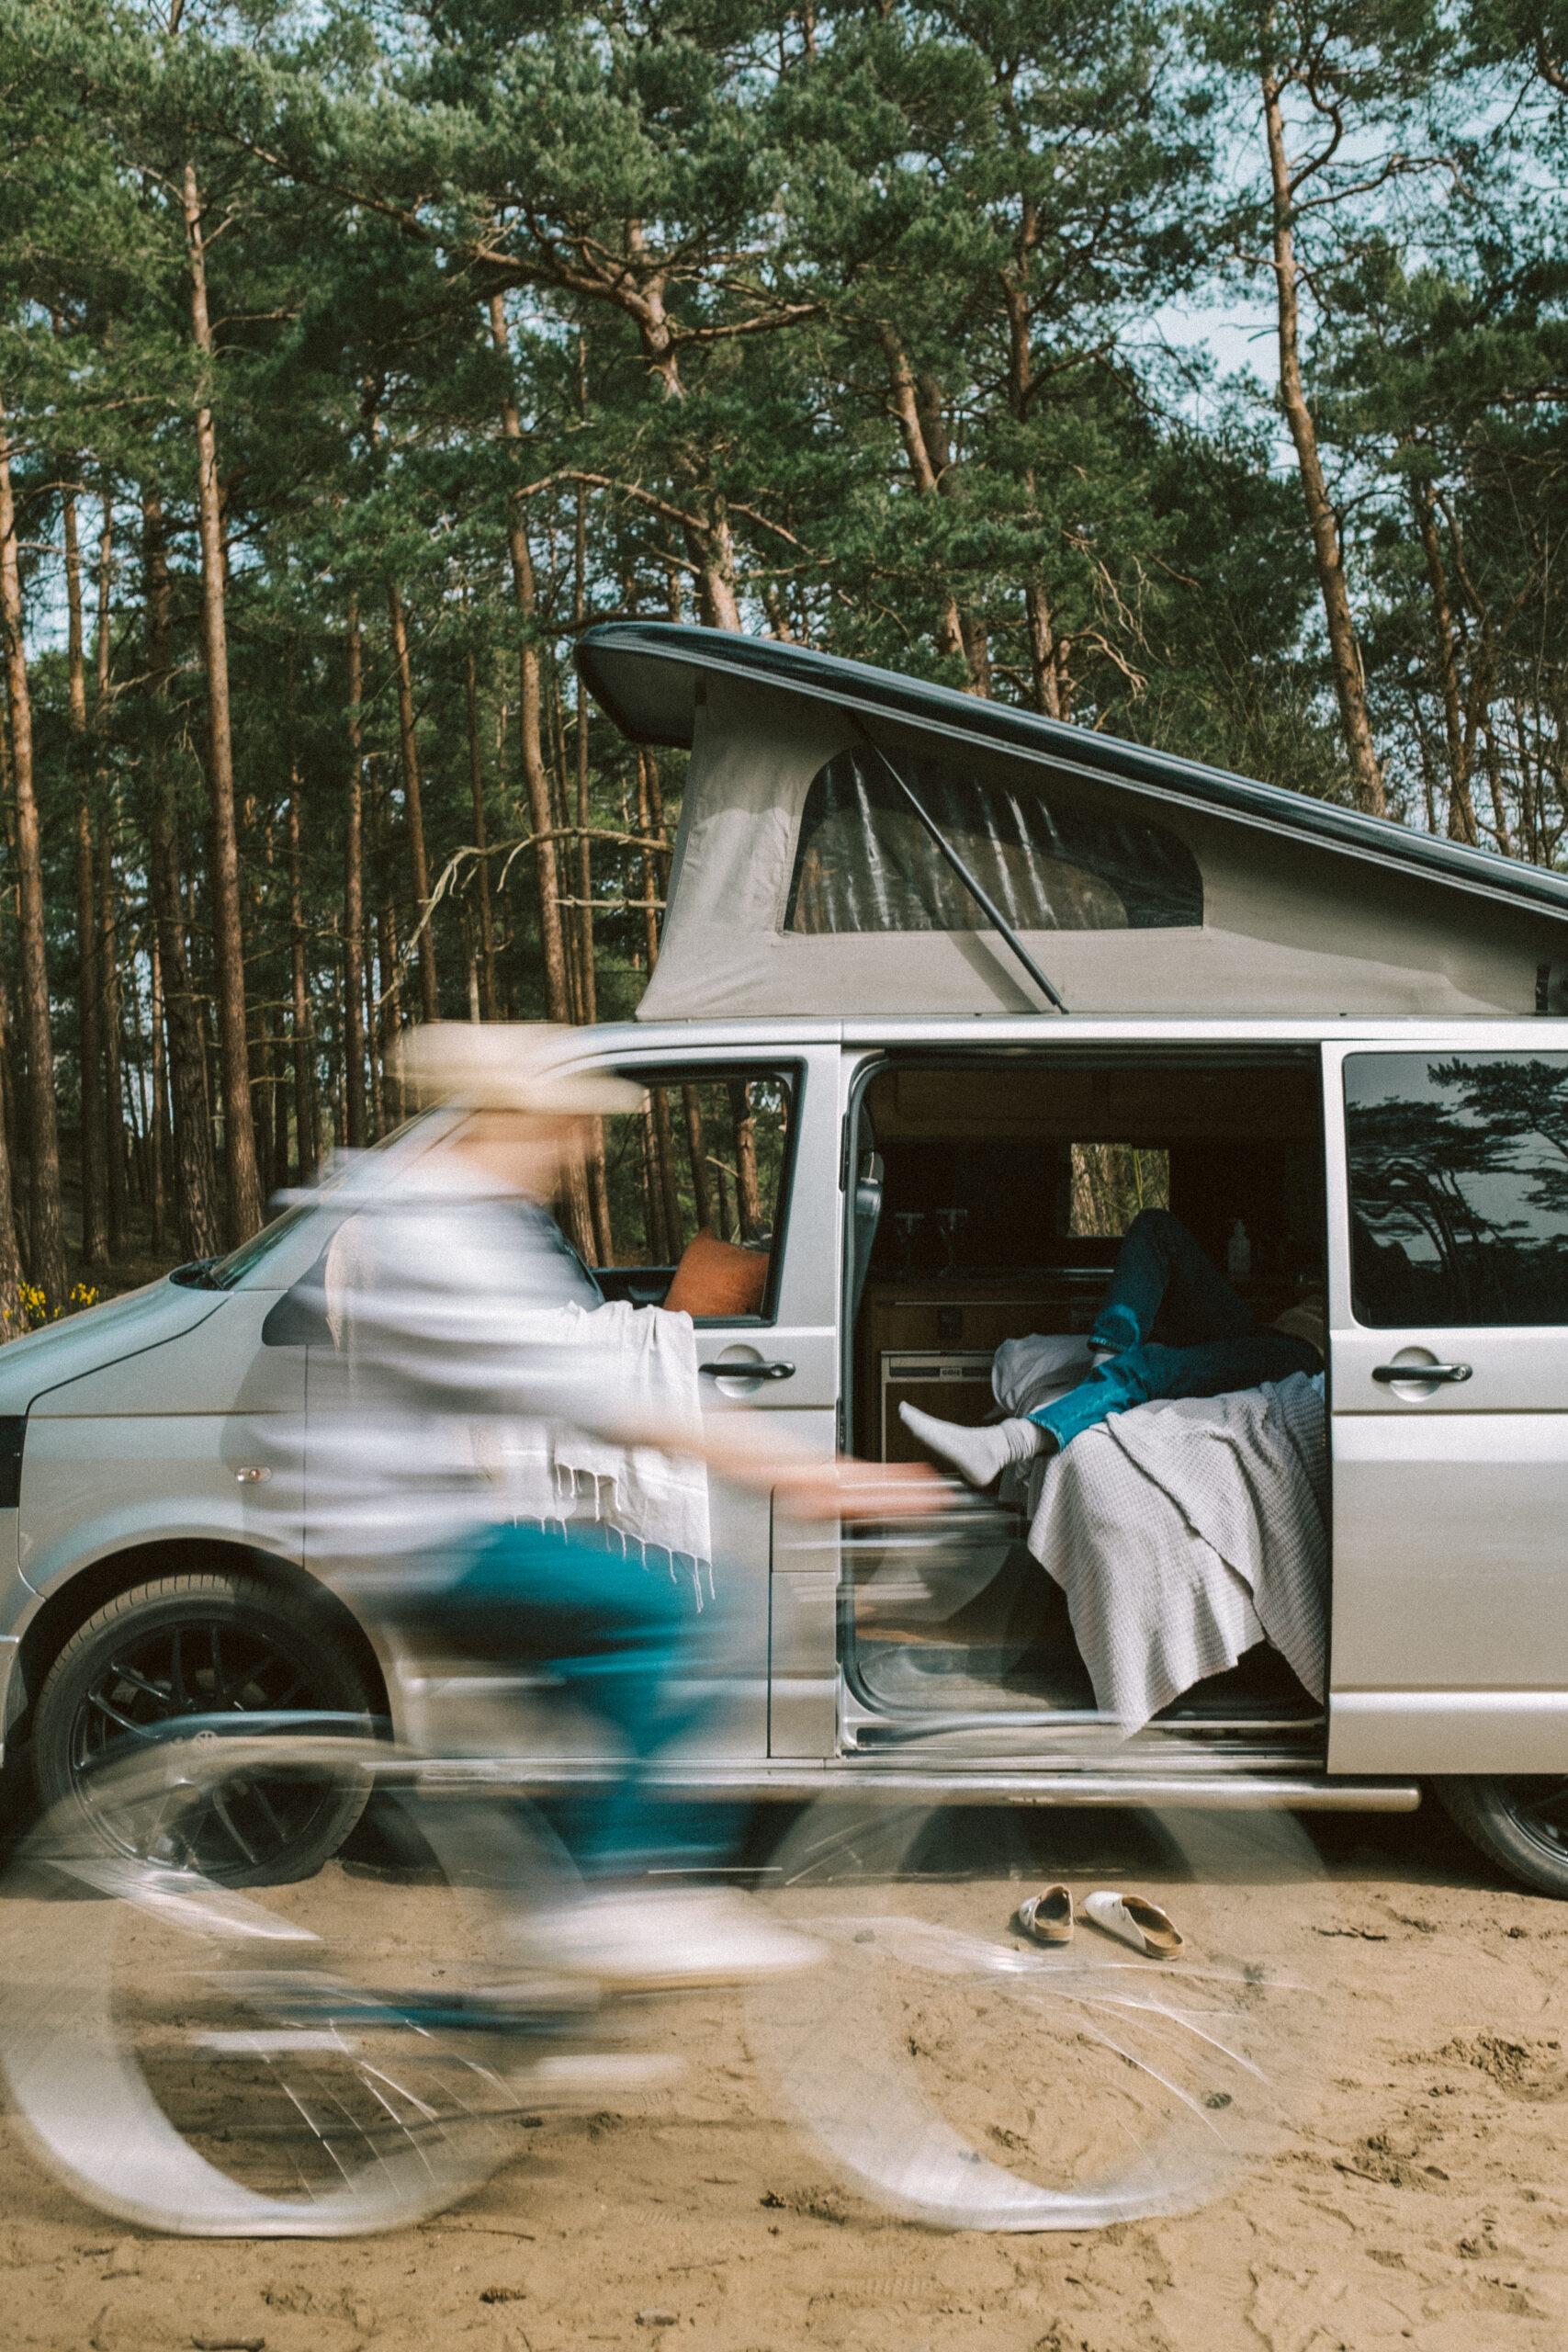 Camp Hox campervan